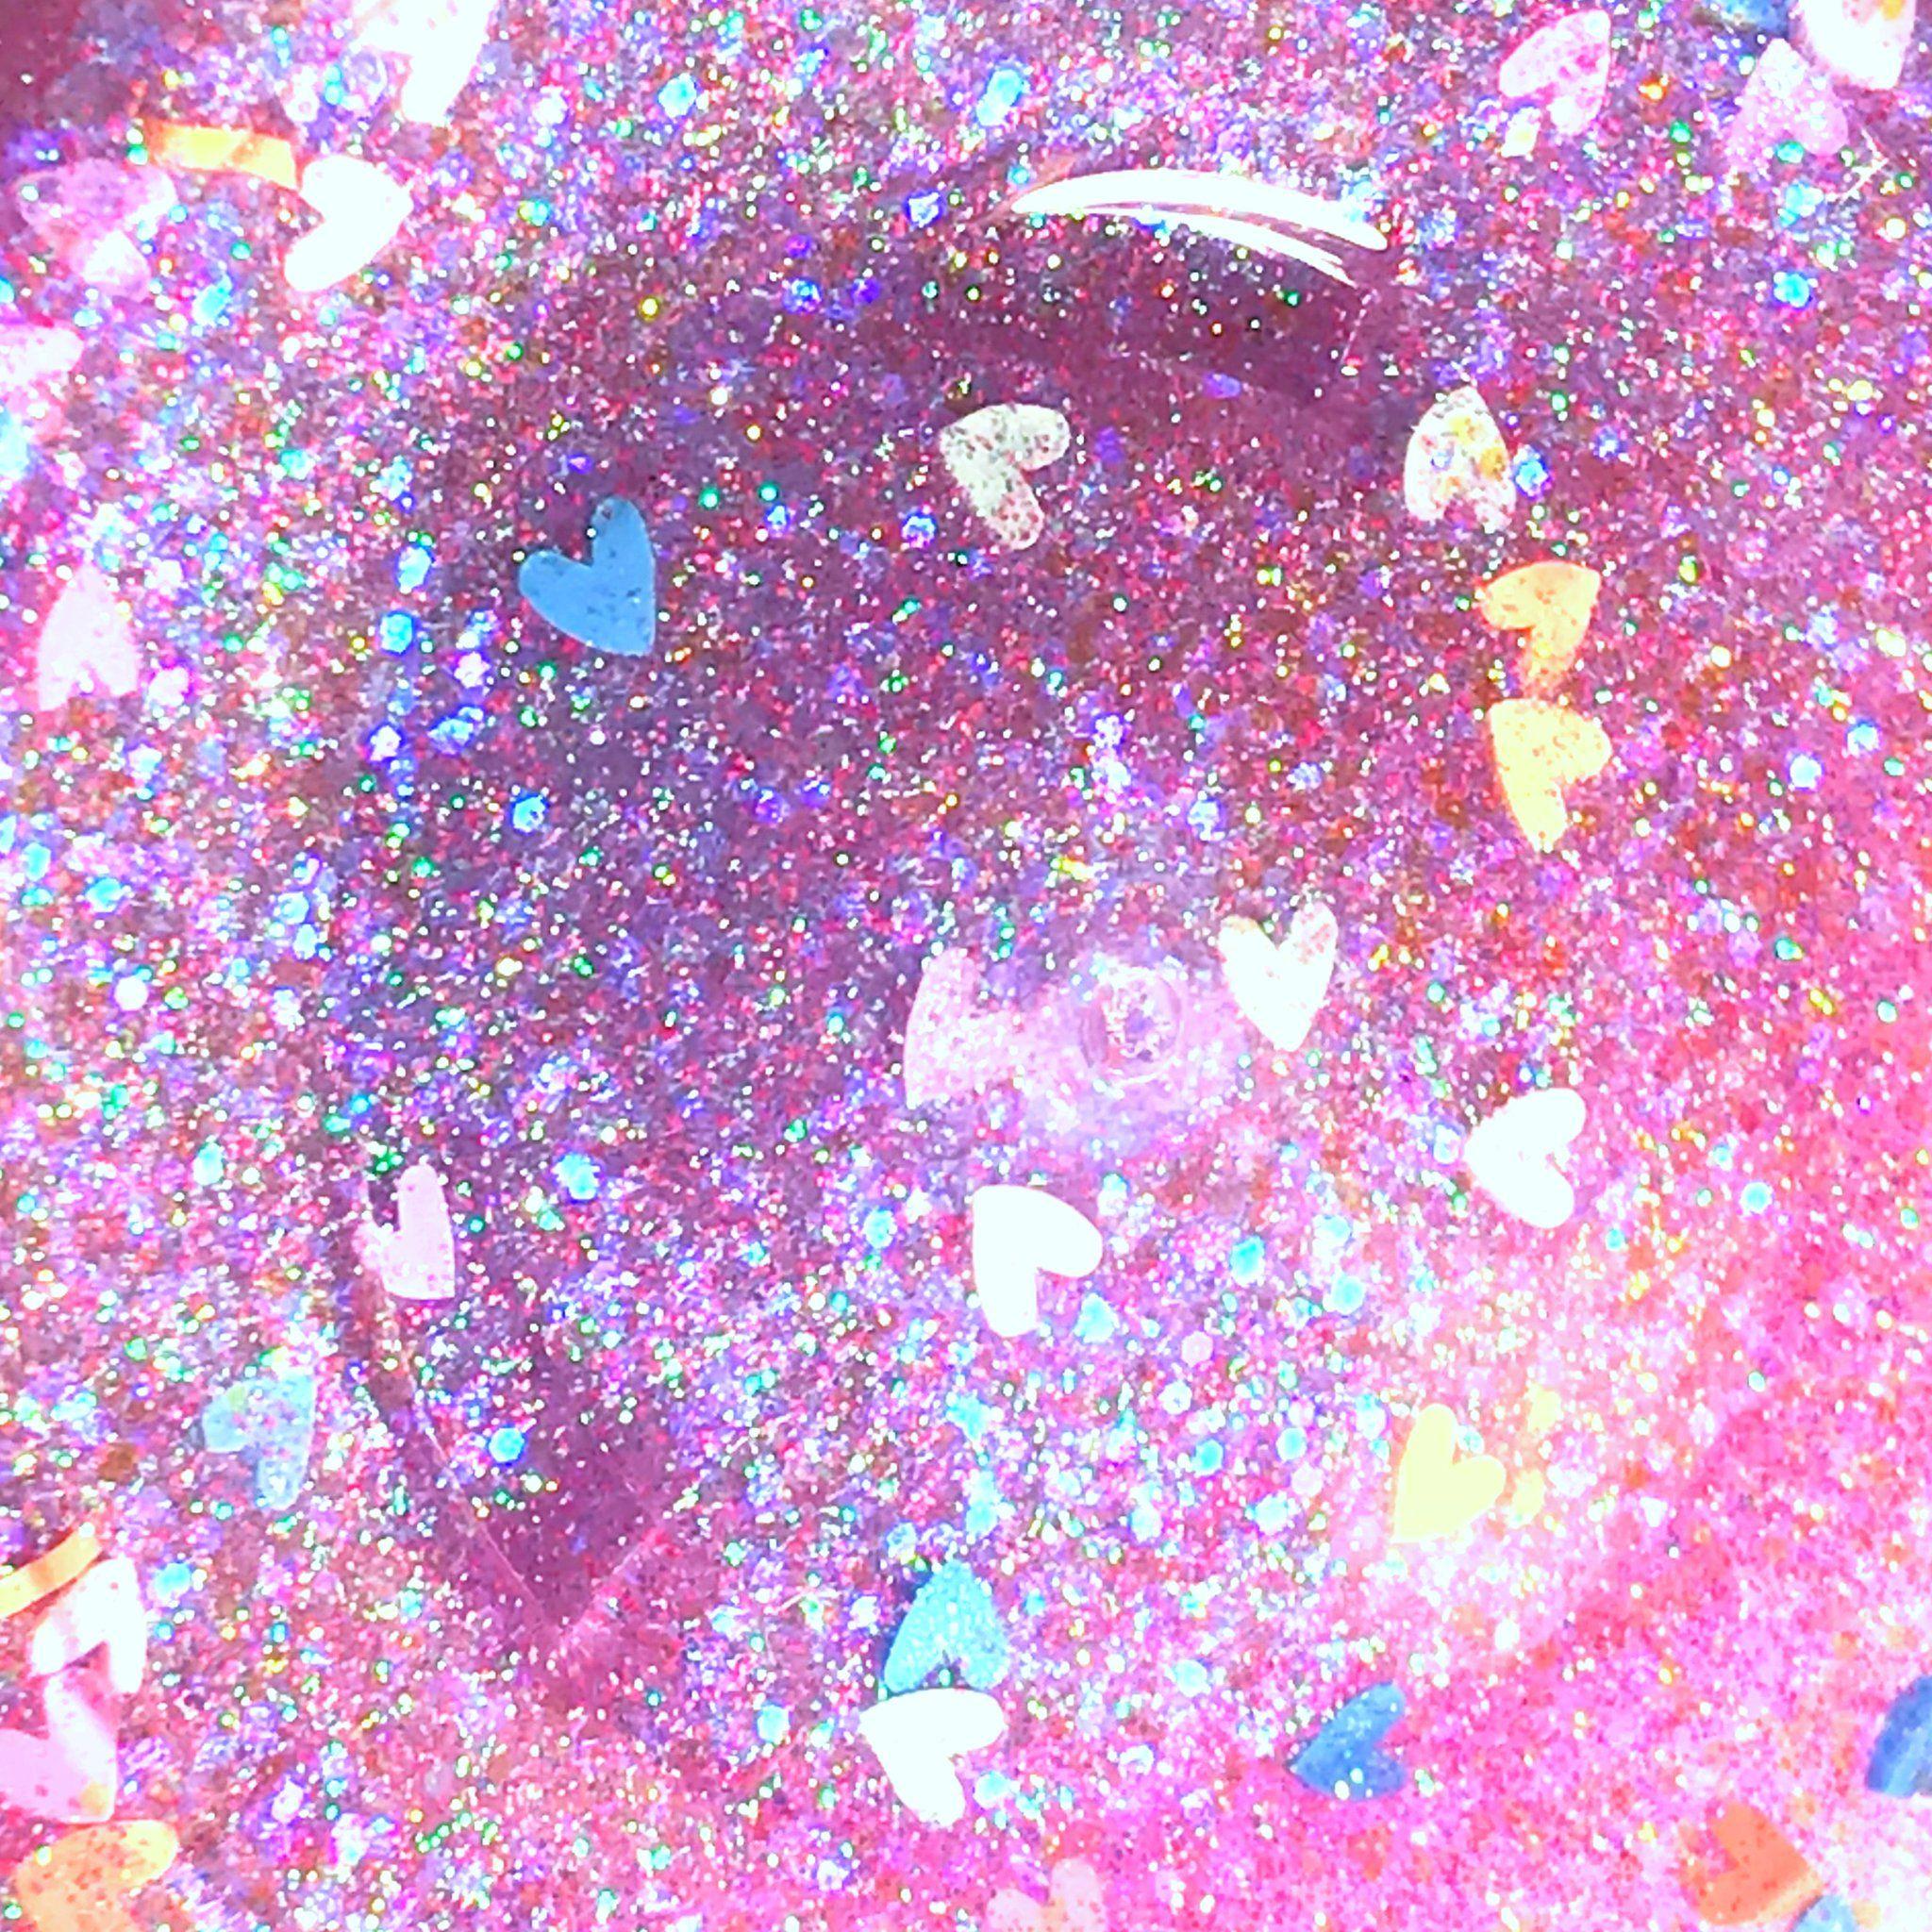 Sweetener Glitter Bomb Slime Peachybbies Slimy Slime